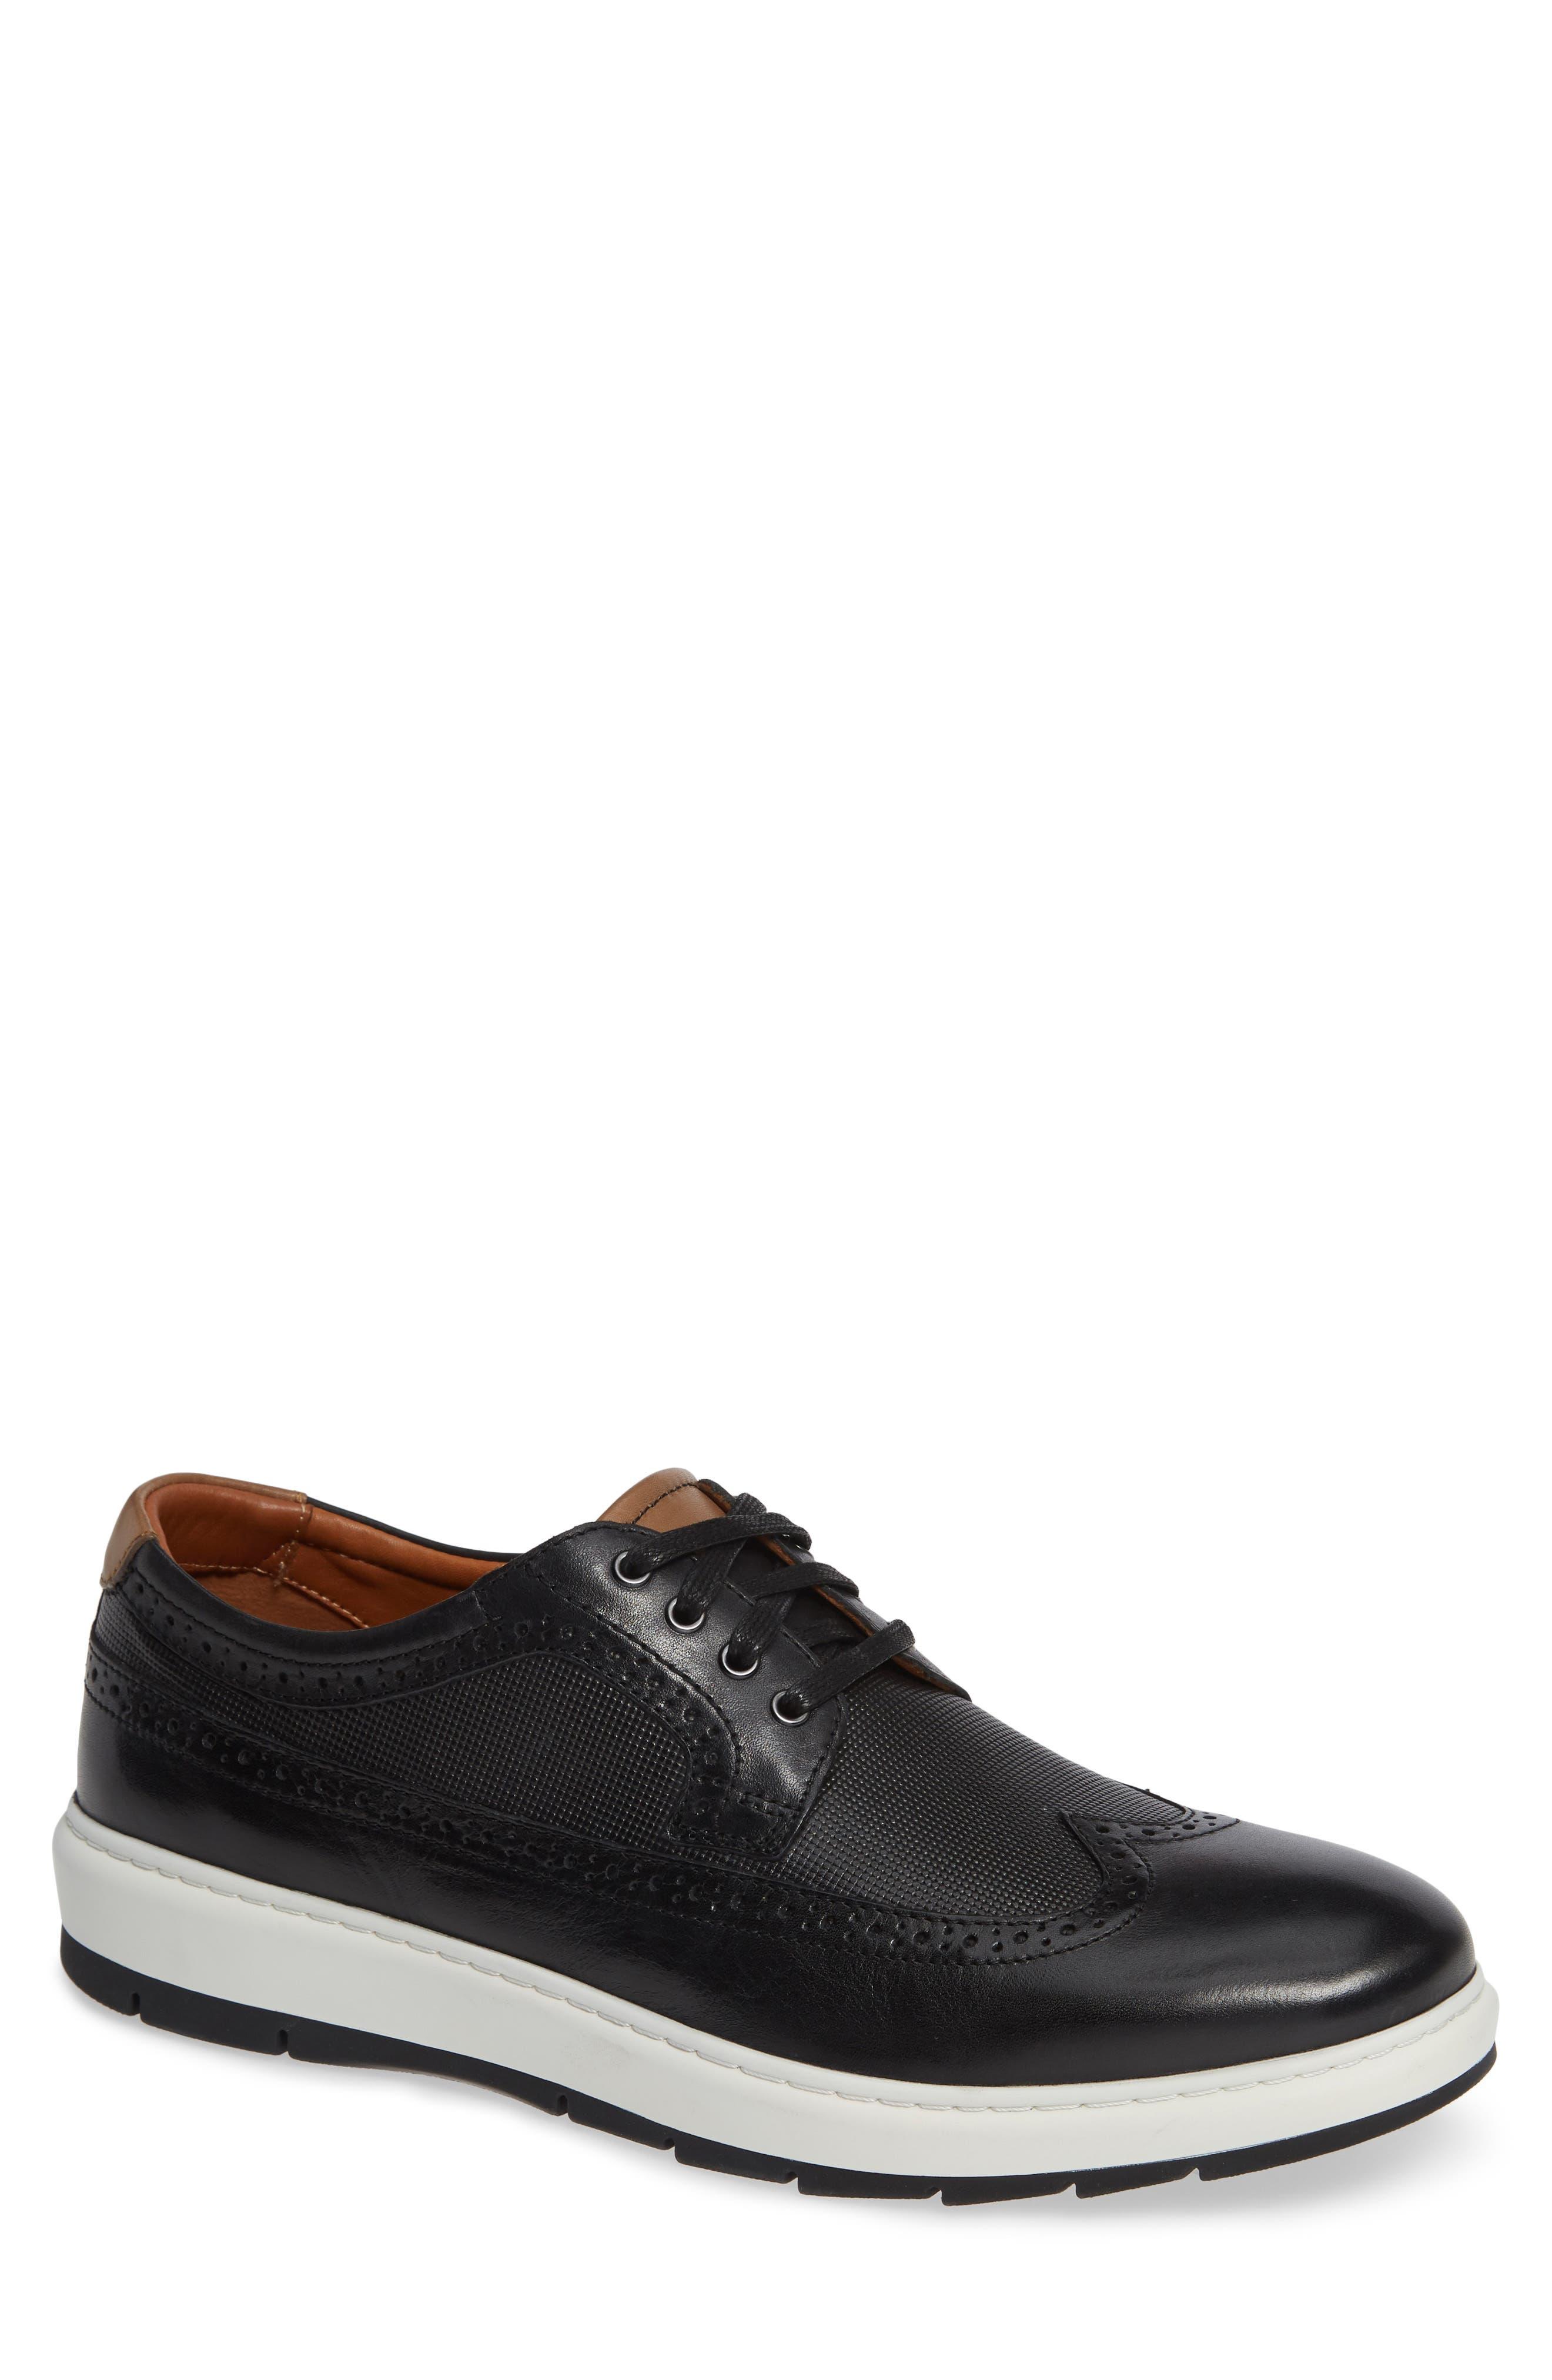 Elliston Wingtip Sneaker,                         Main,                         color, BLACK LEATHER